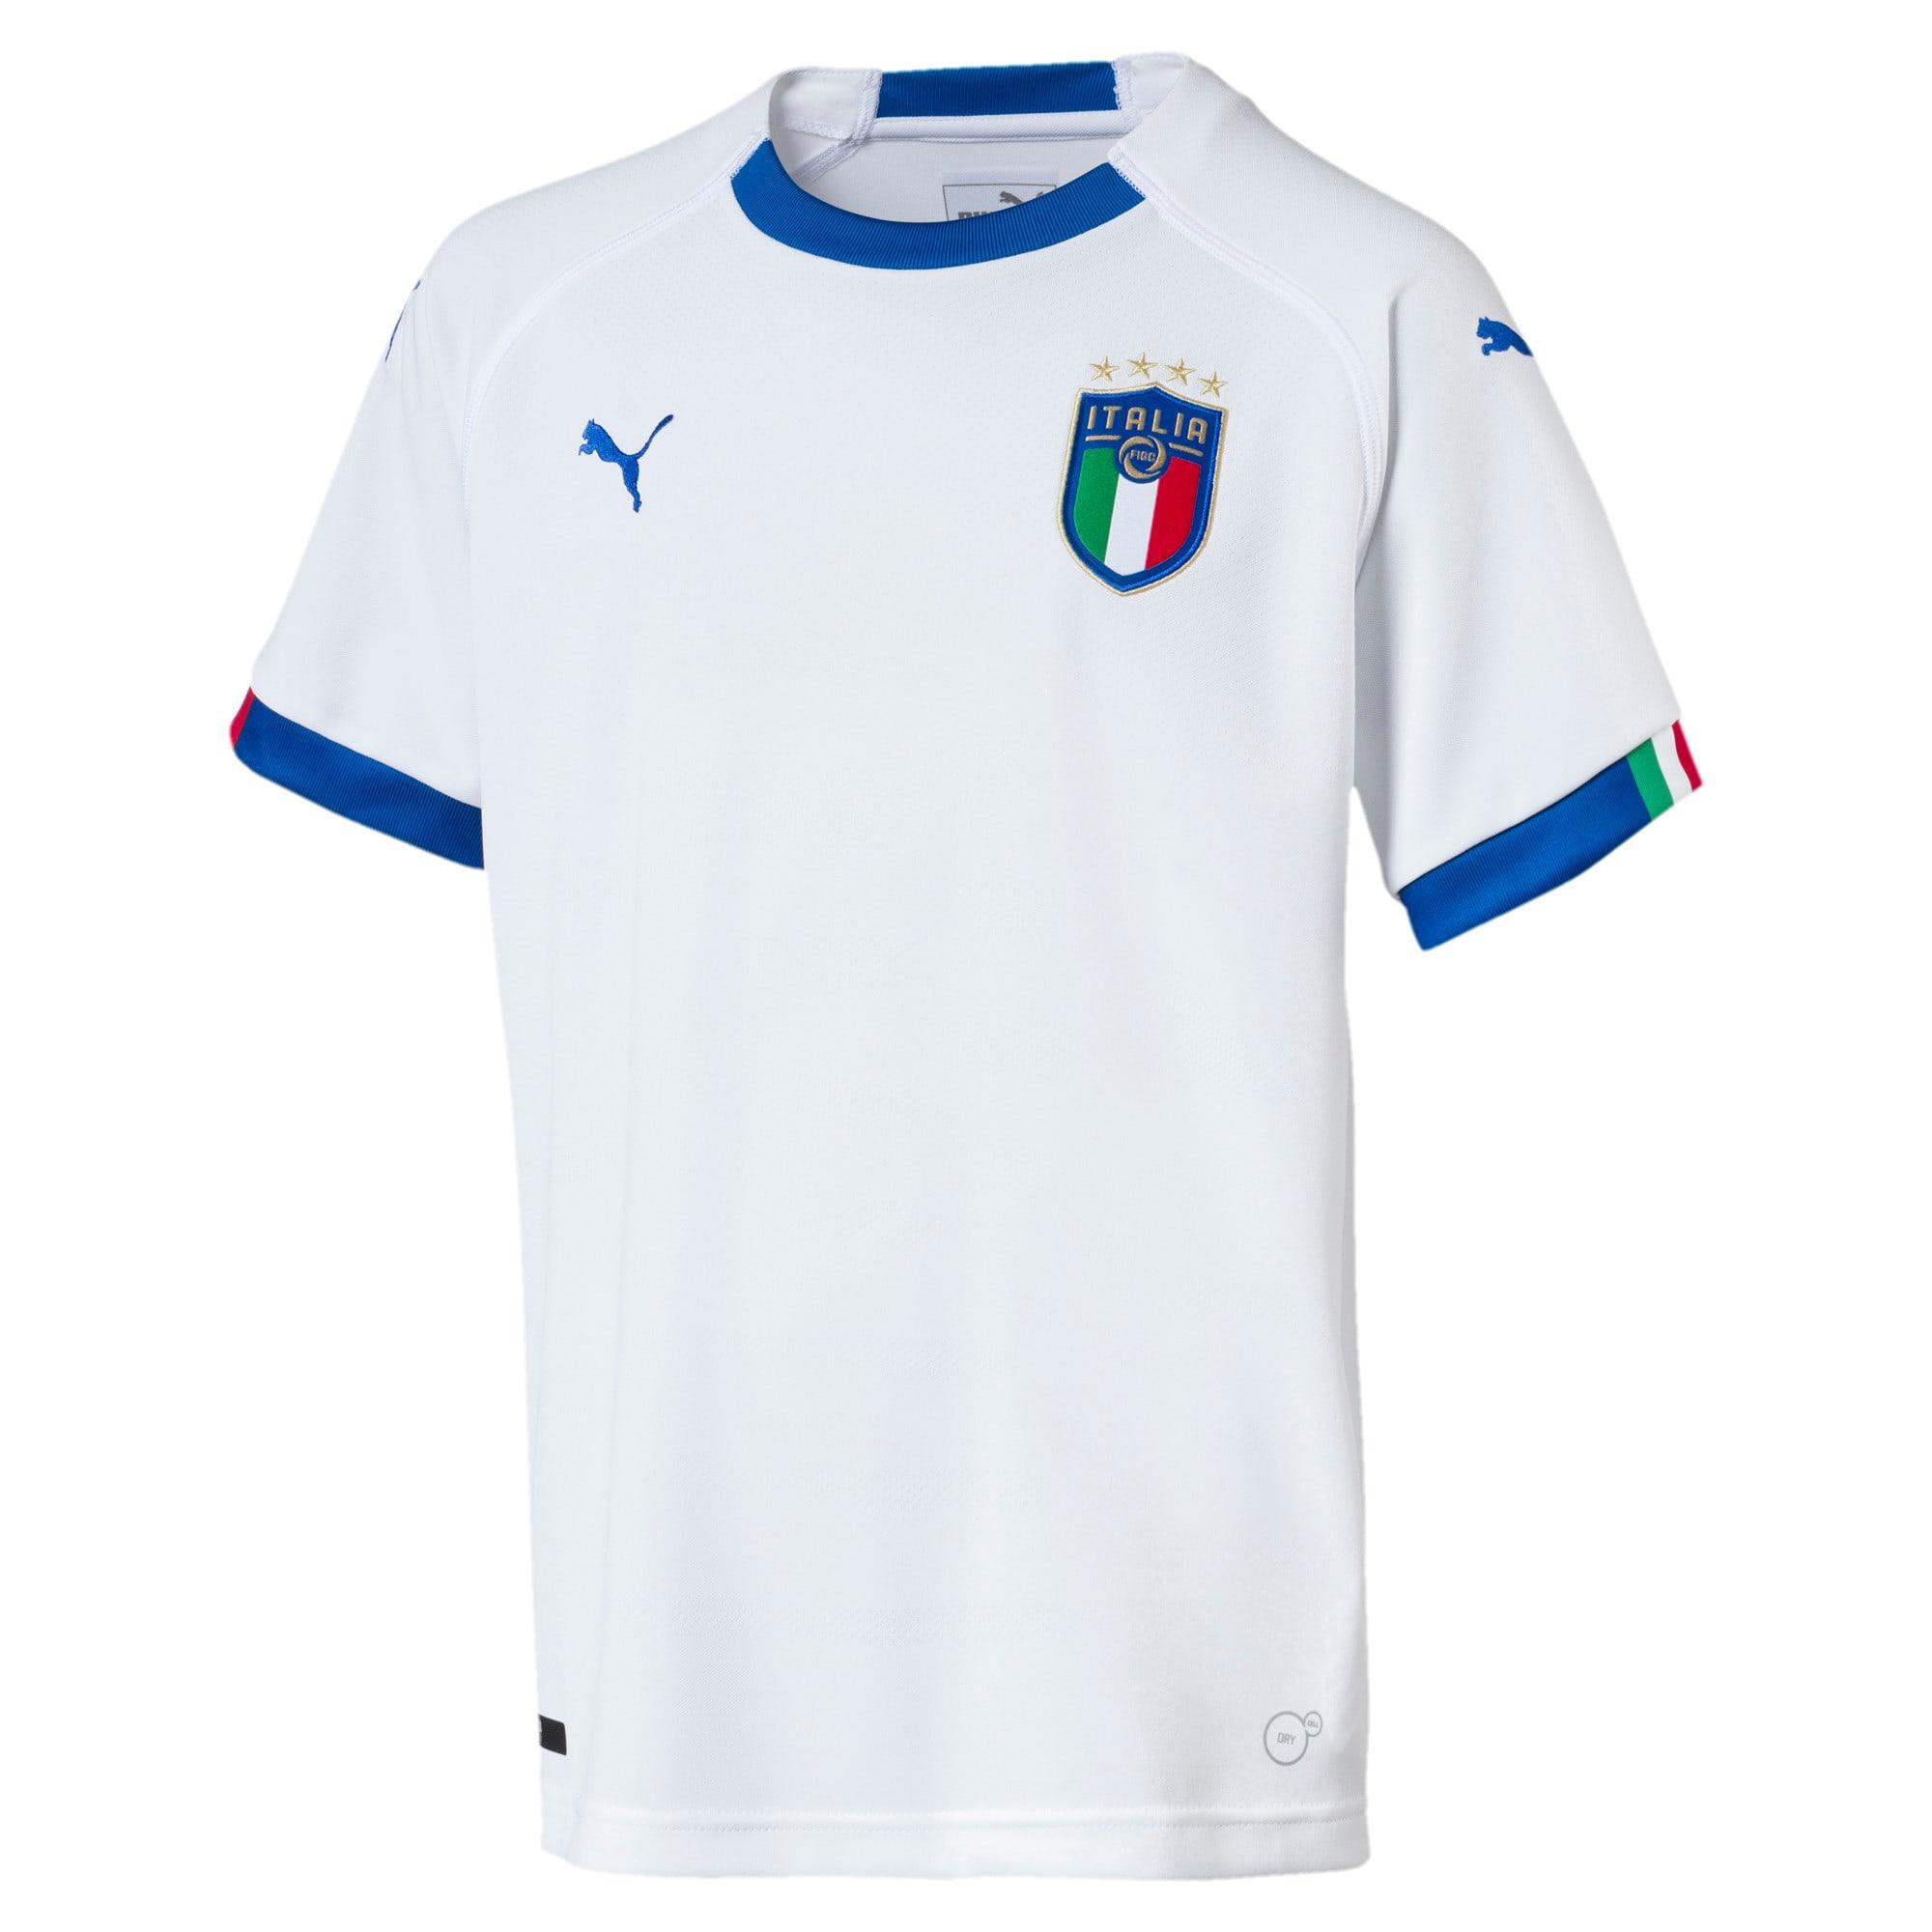 Thumbnail 1 of FIGC Italia Kids' Away Shirt, Puma White-Team Power Blue, medium